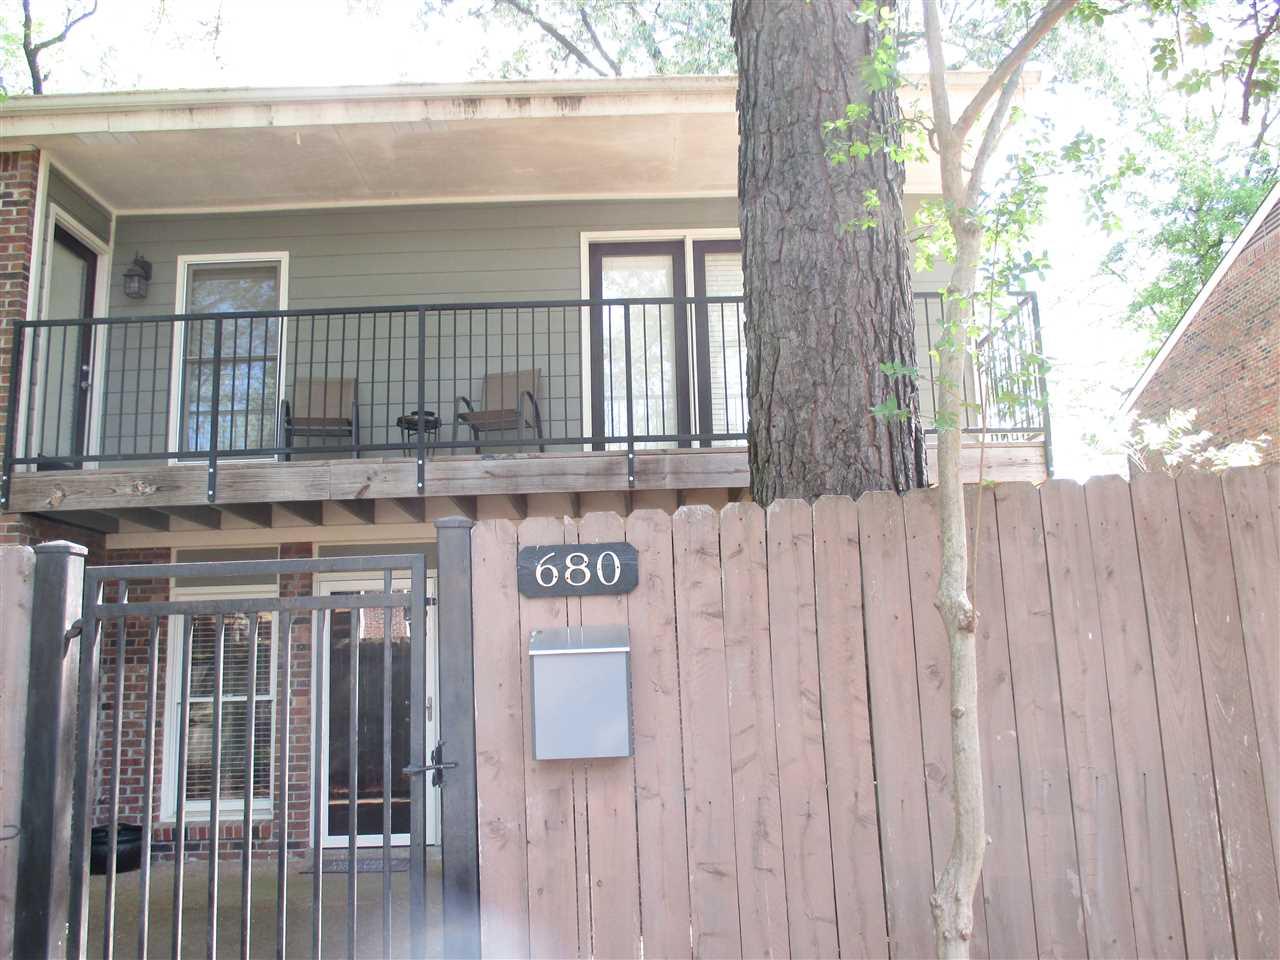 680 HOTCHKISS ST, Memphis, TN 38104